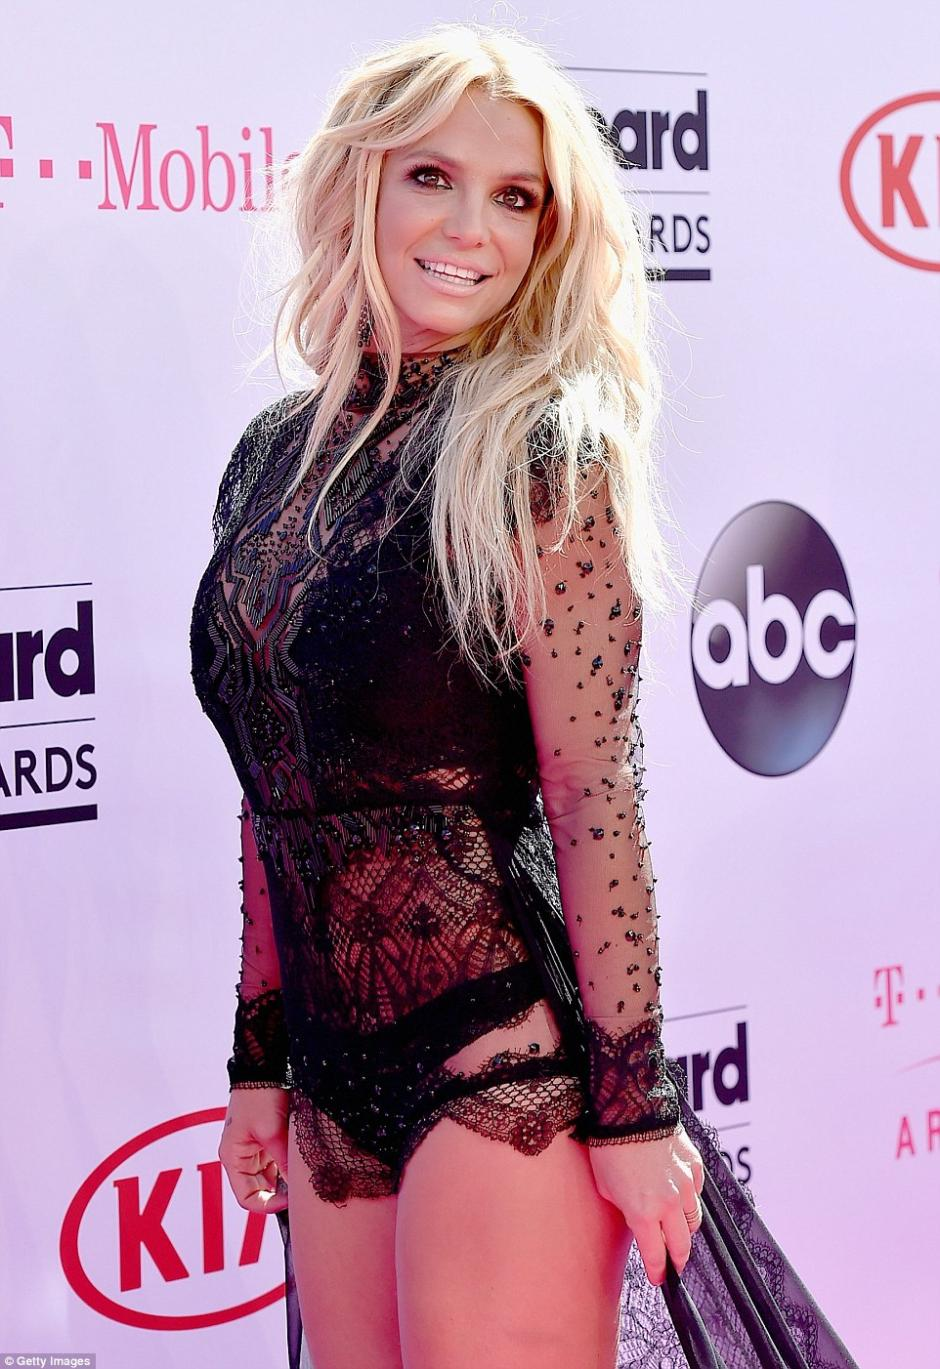 Spears sonrió para las cámaras. (Foto: Getty Images)